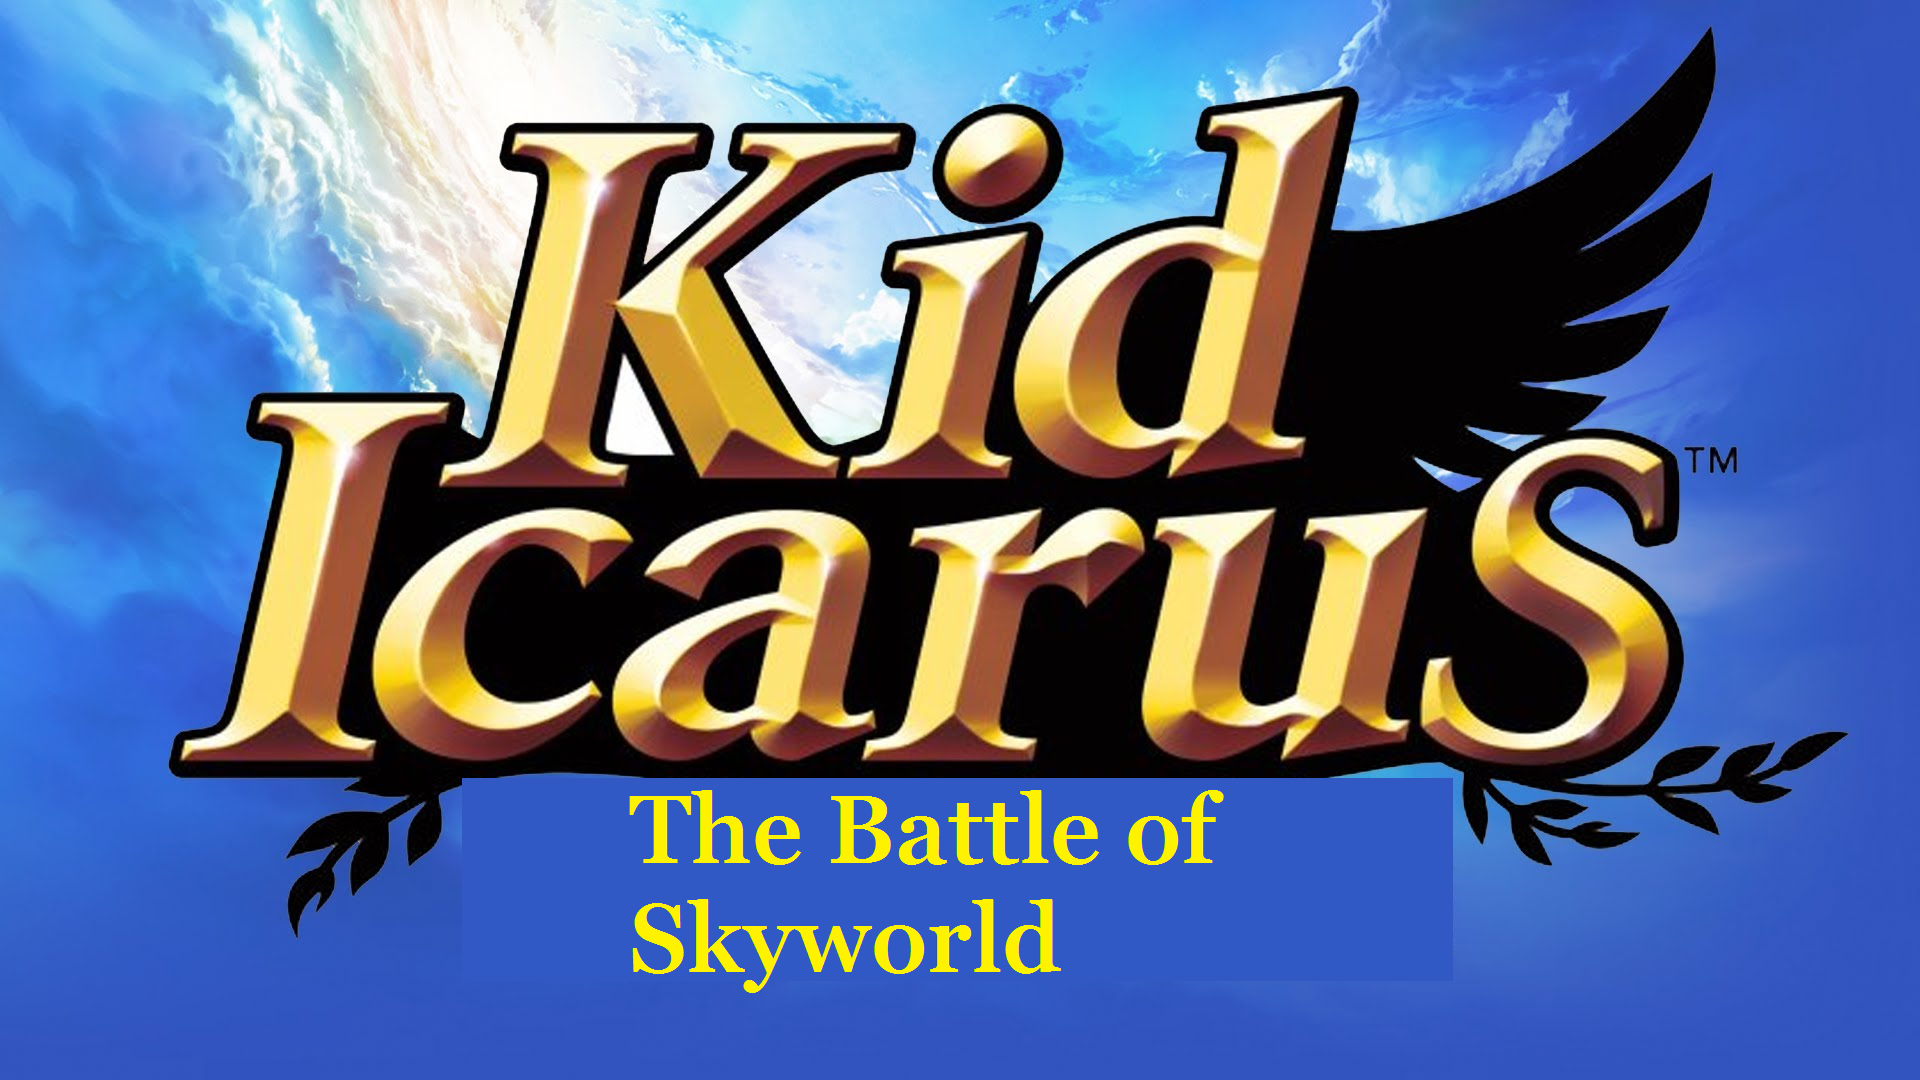 Kid Icarus: The Battle of Skyworld